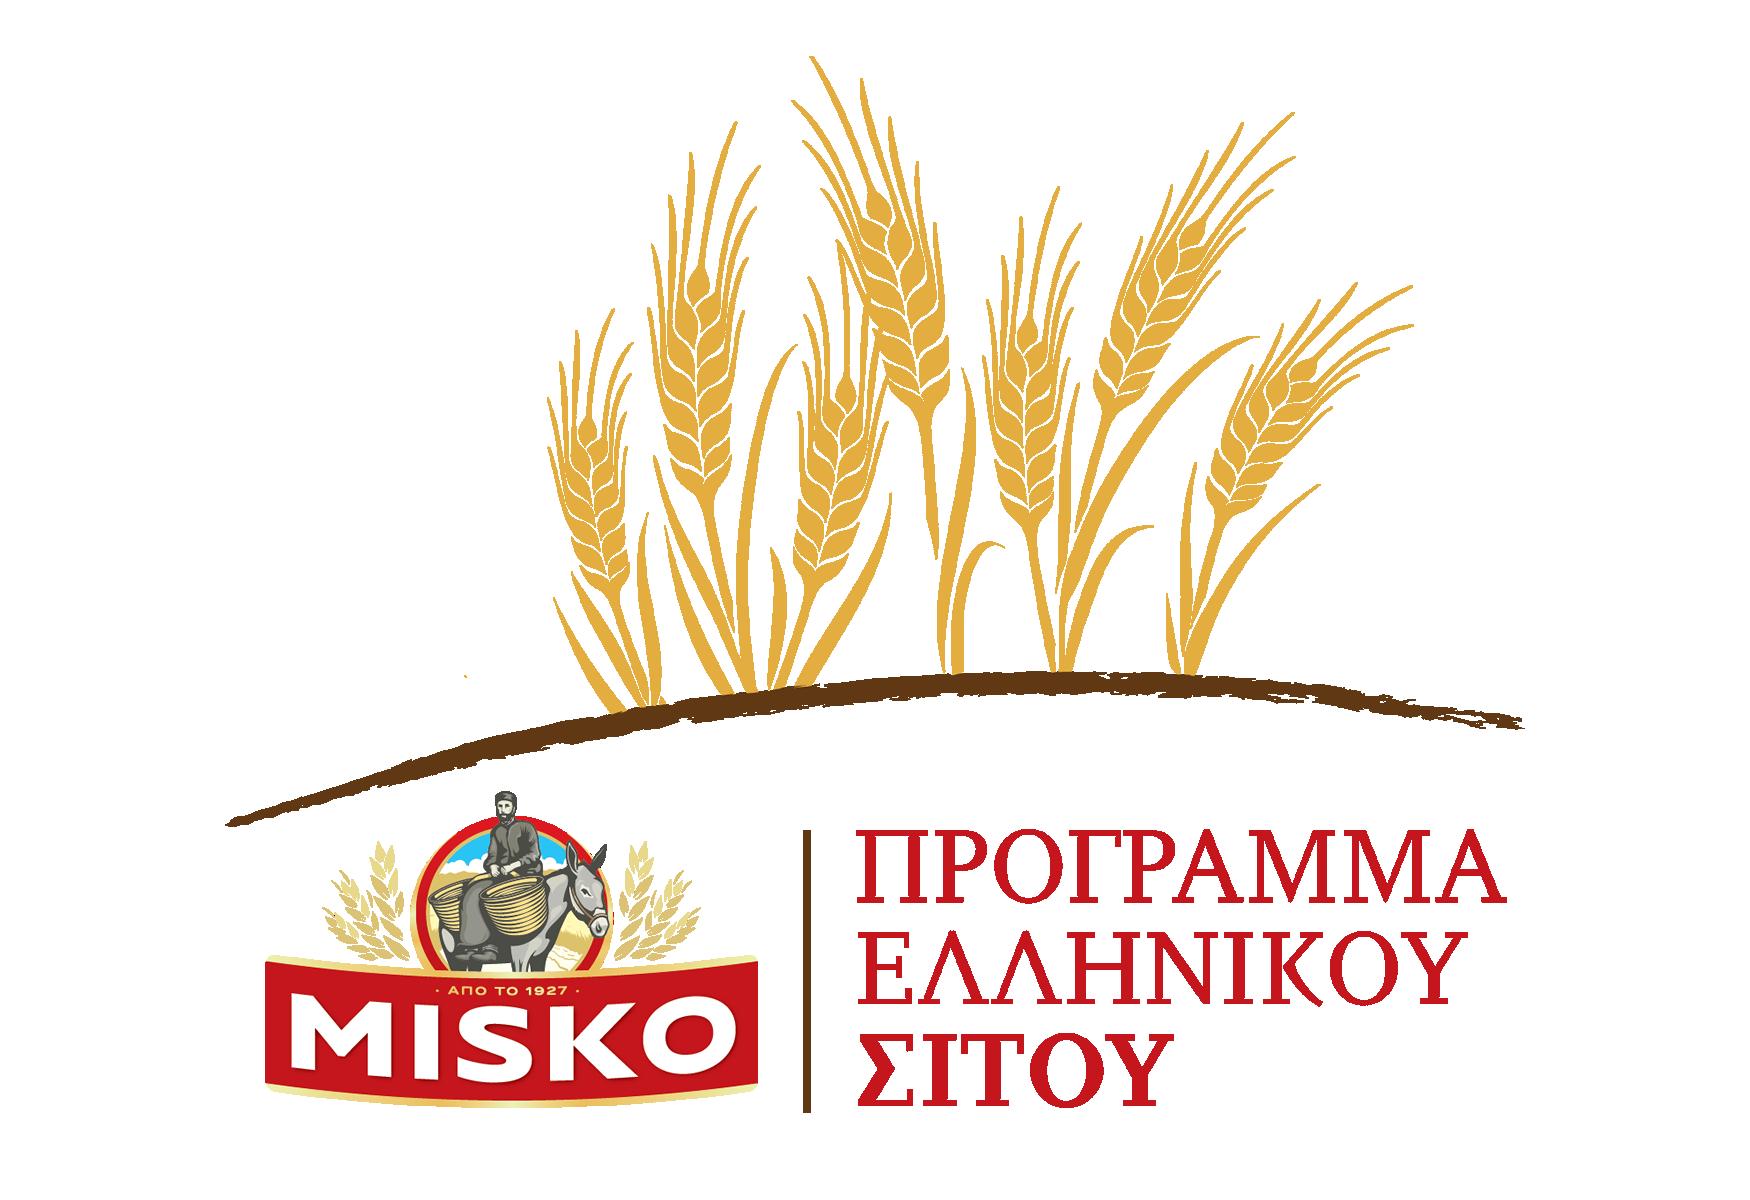 http://miskoprogrammasitou.gr/